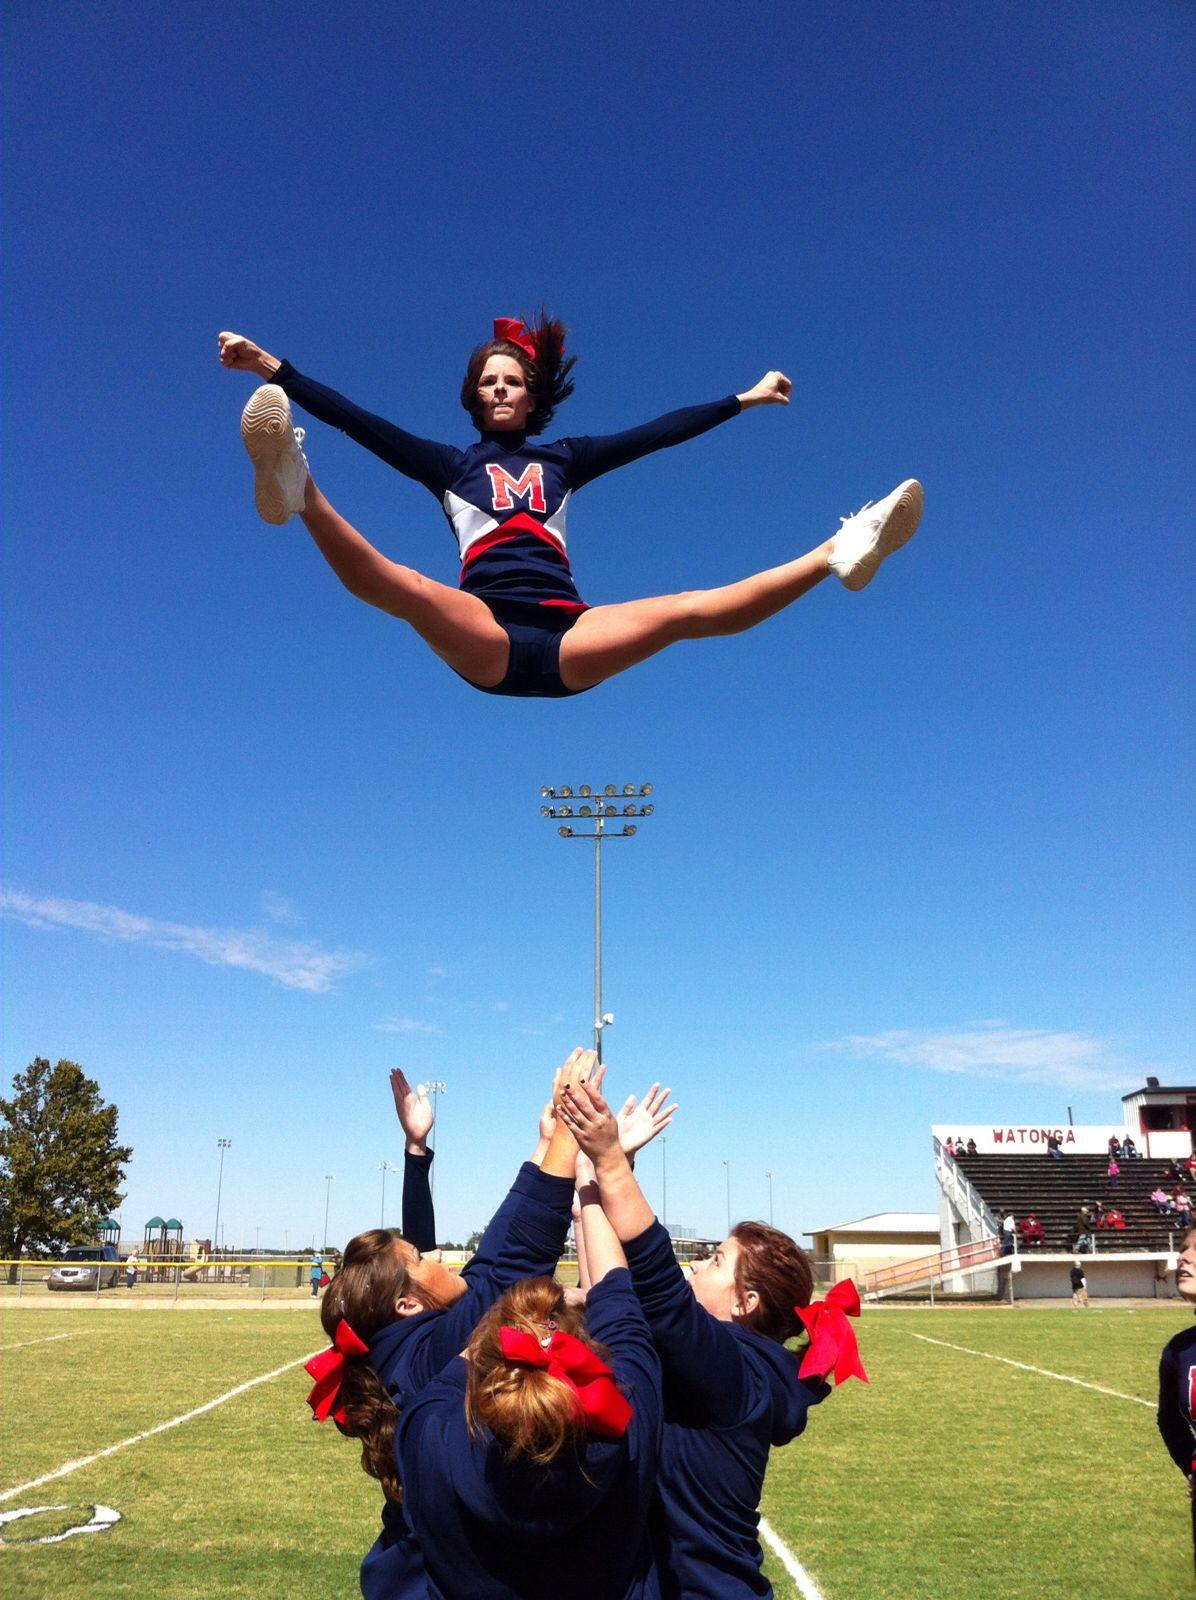 American Cheer Express:Cheerleading Source:cheerleading stunt Pictures high school cheerleading stunts